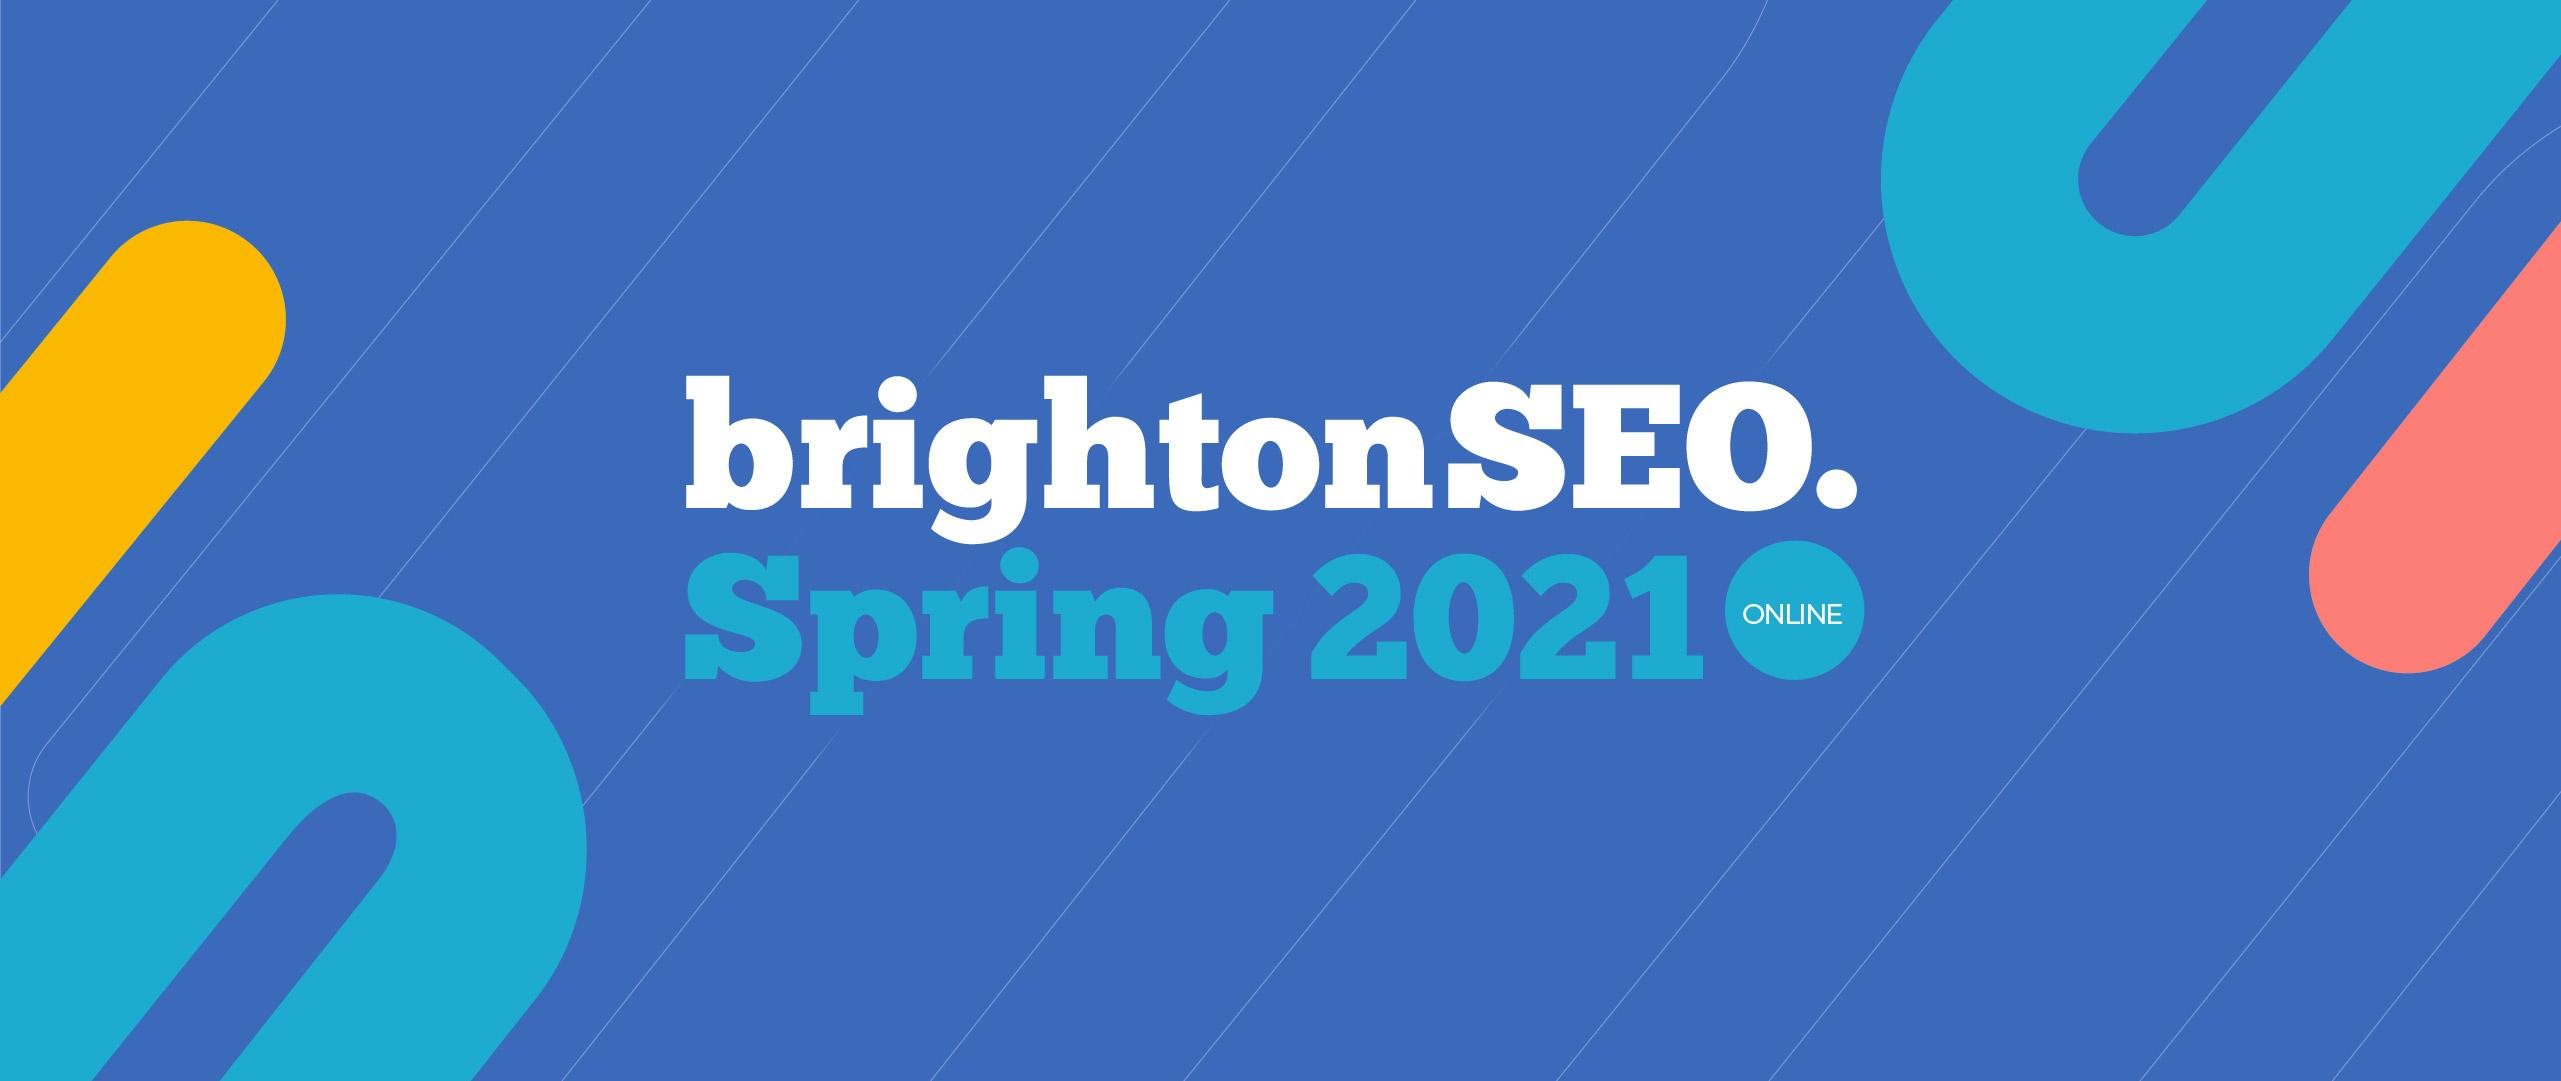 BrightonSEO Day 2 summary